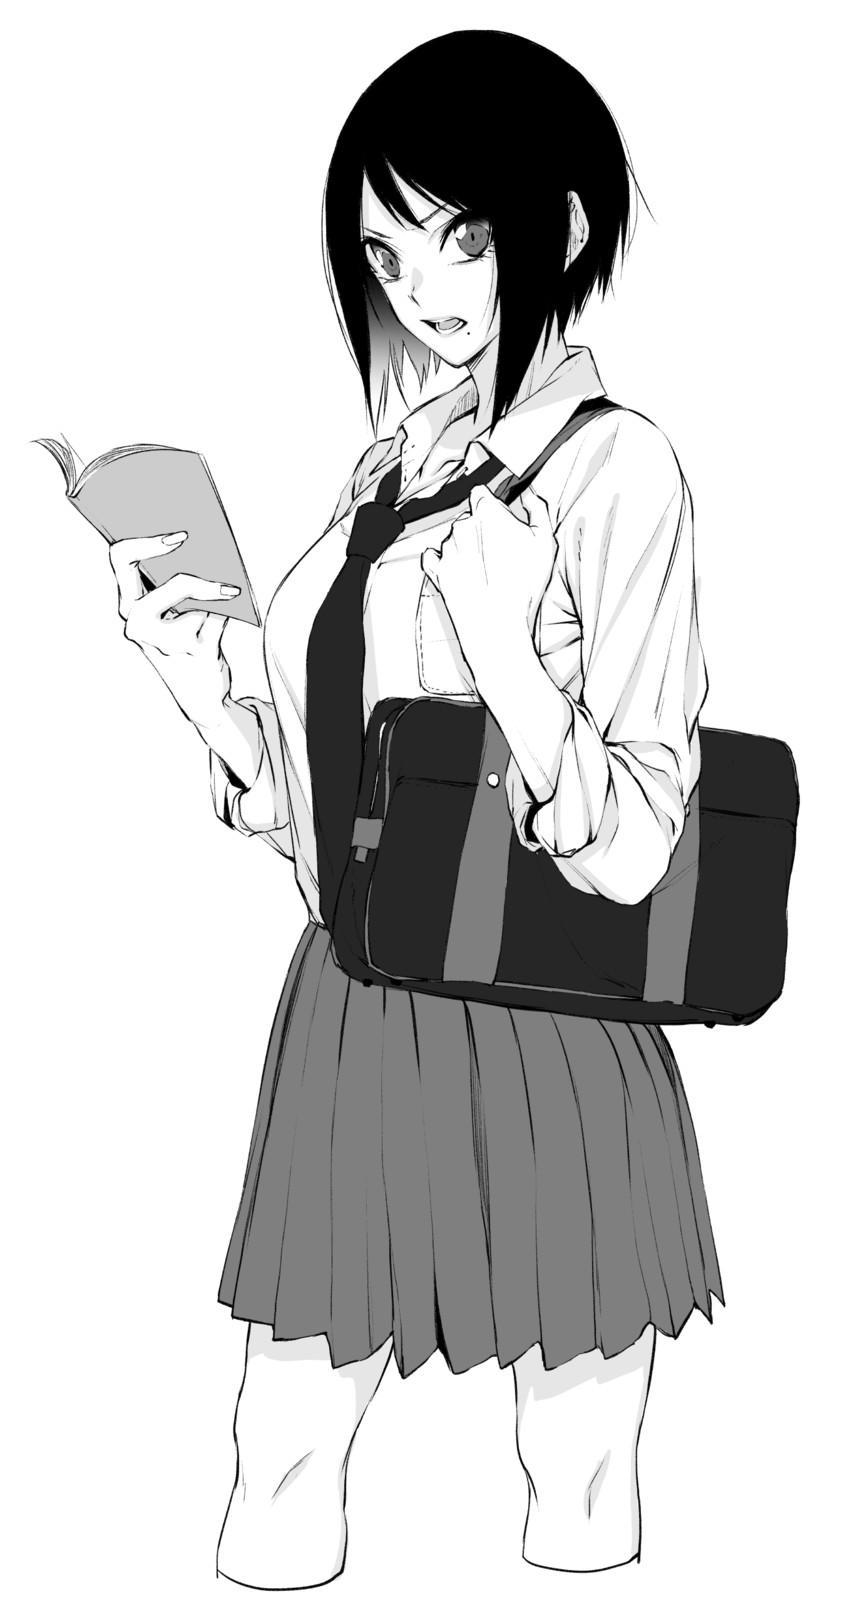 original drawn by vice (kuronekohadokoheiku)